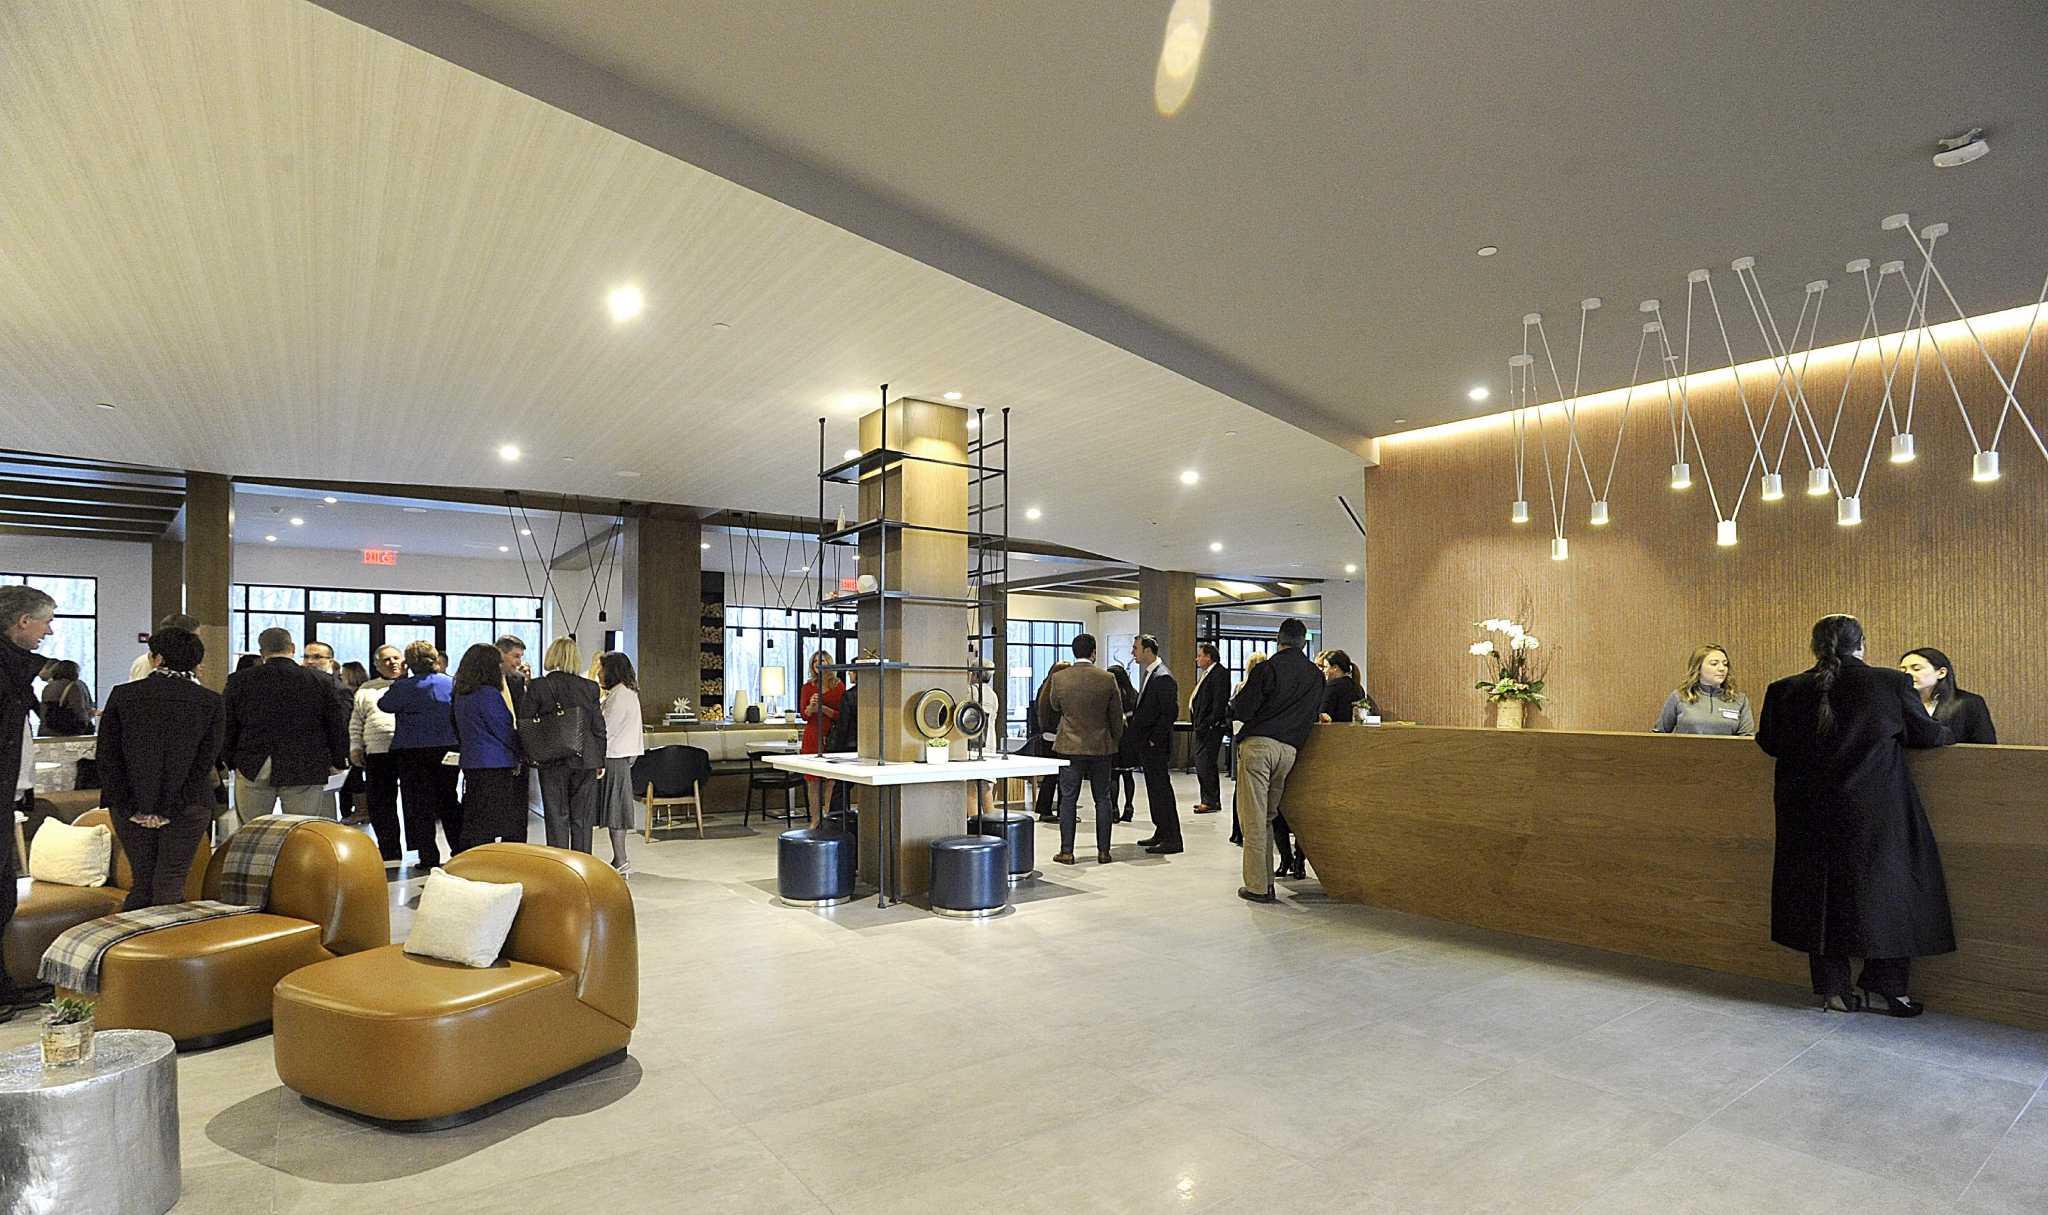 Hotel zero degrees opens boutique hotel in danbury newstimes